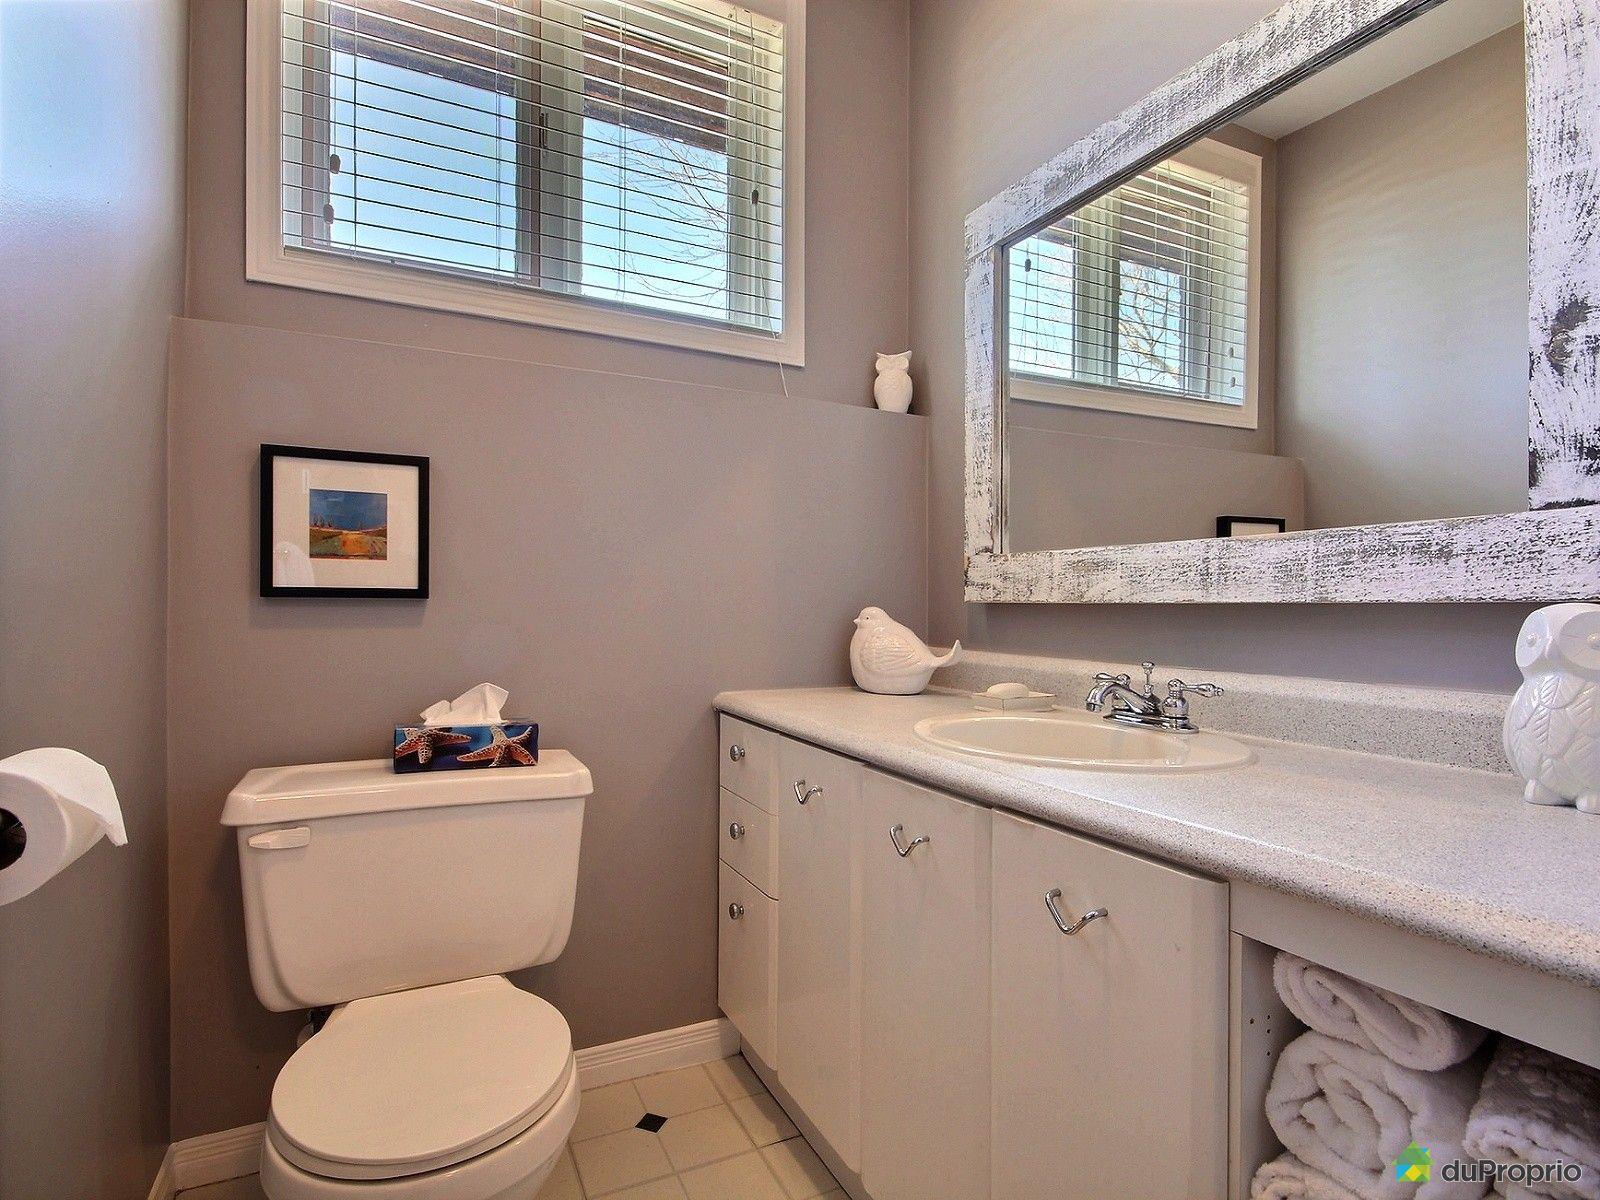 maison vendre aylmer 113 avenue des champignons immobilier qu bec duproprio 698329. Black Bedroom Furniture Sets. Home Design Ideas